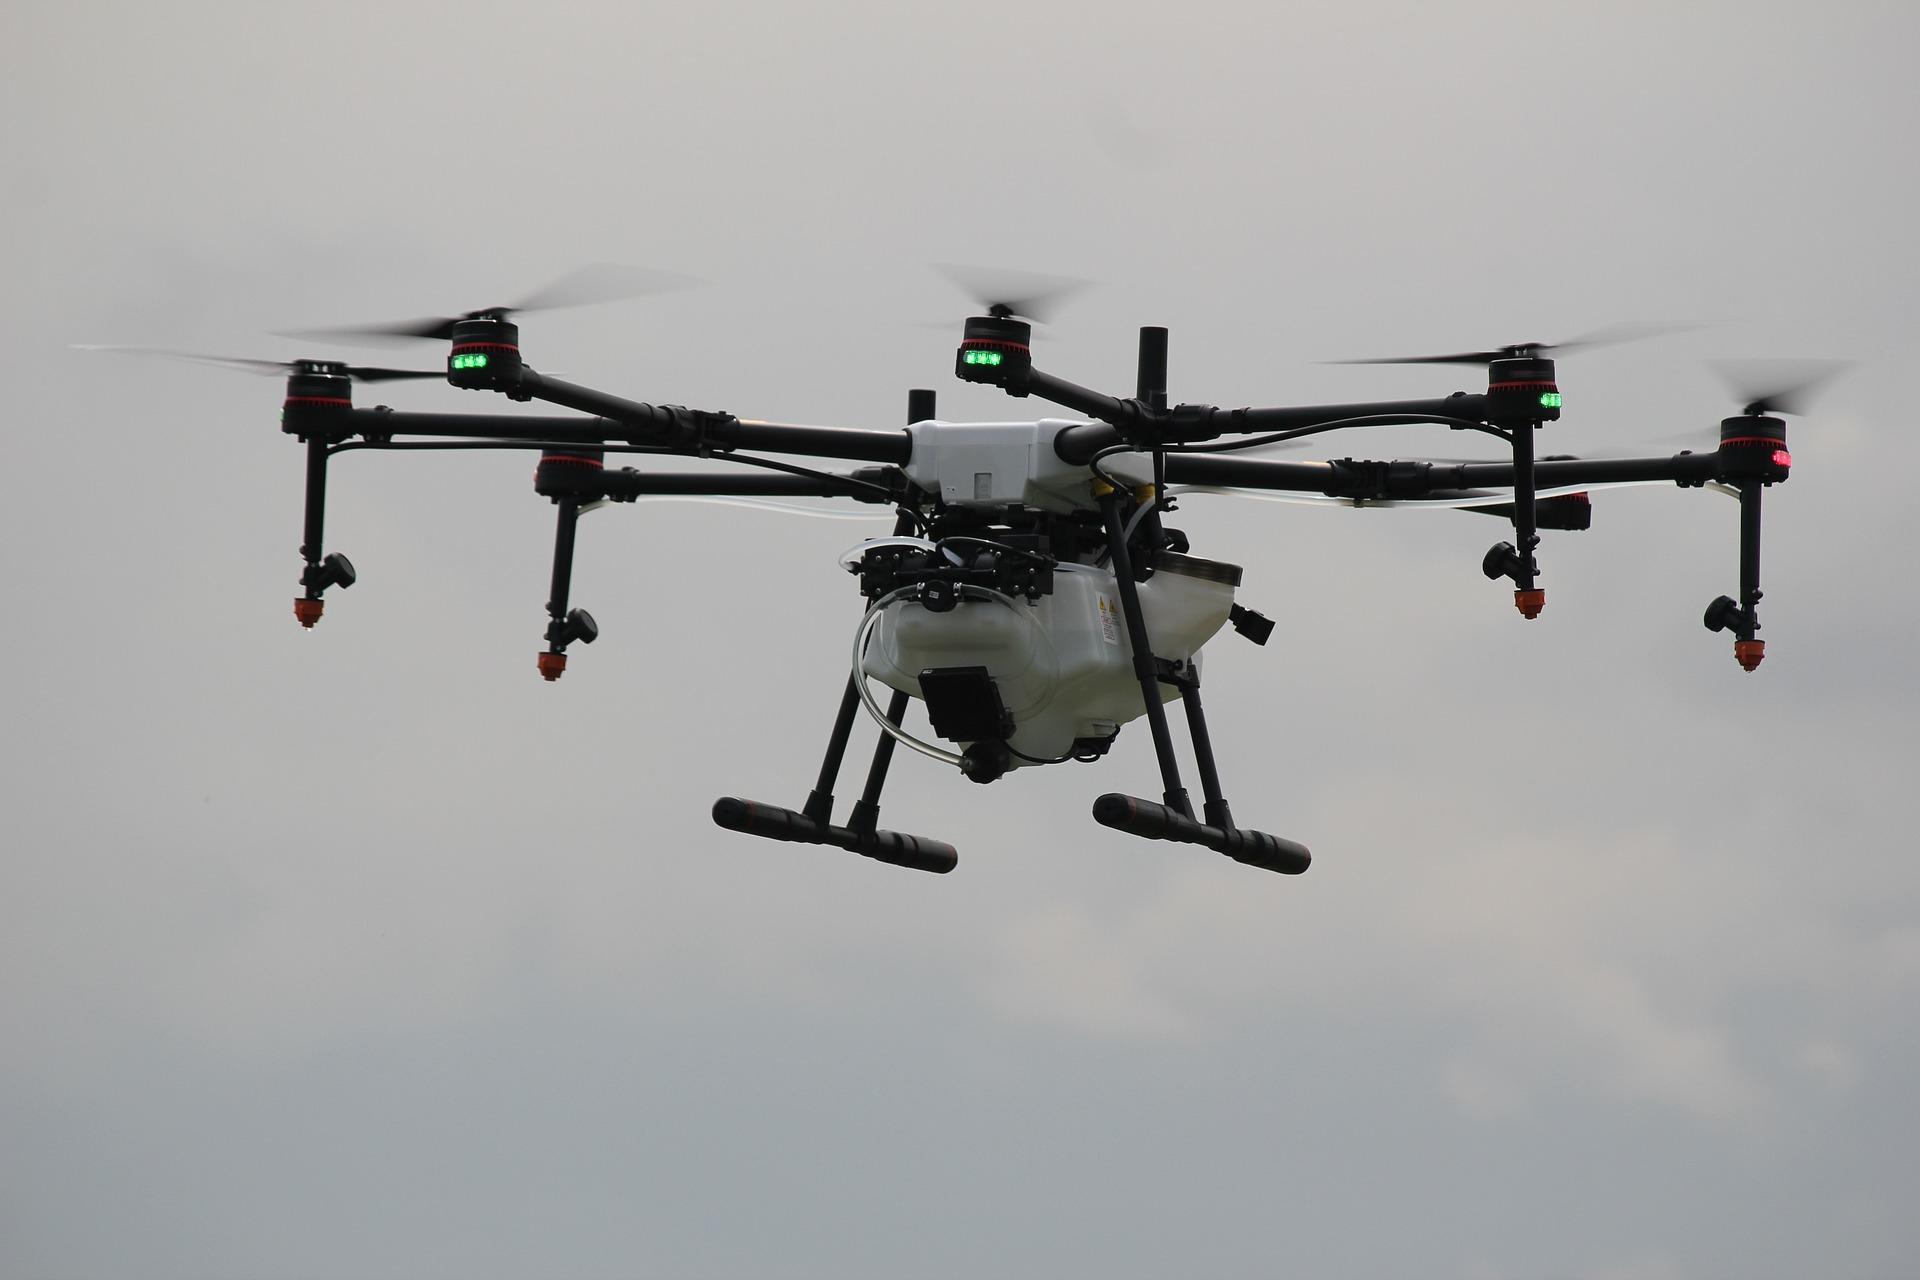 Imagem de Aeroporto de Congonhas tem 34 voos desviados por causa de drone no tecmundo